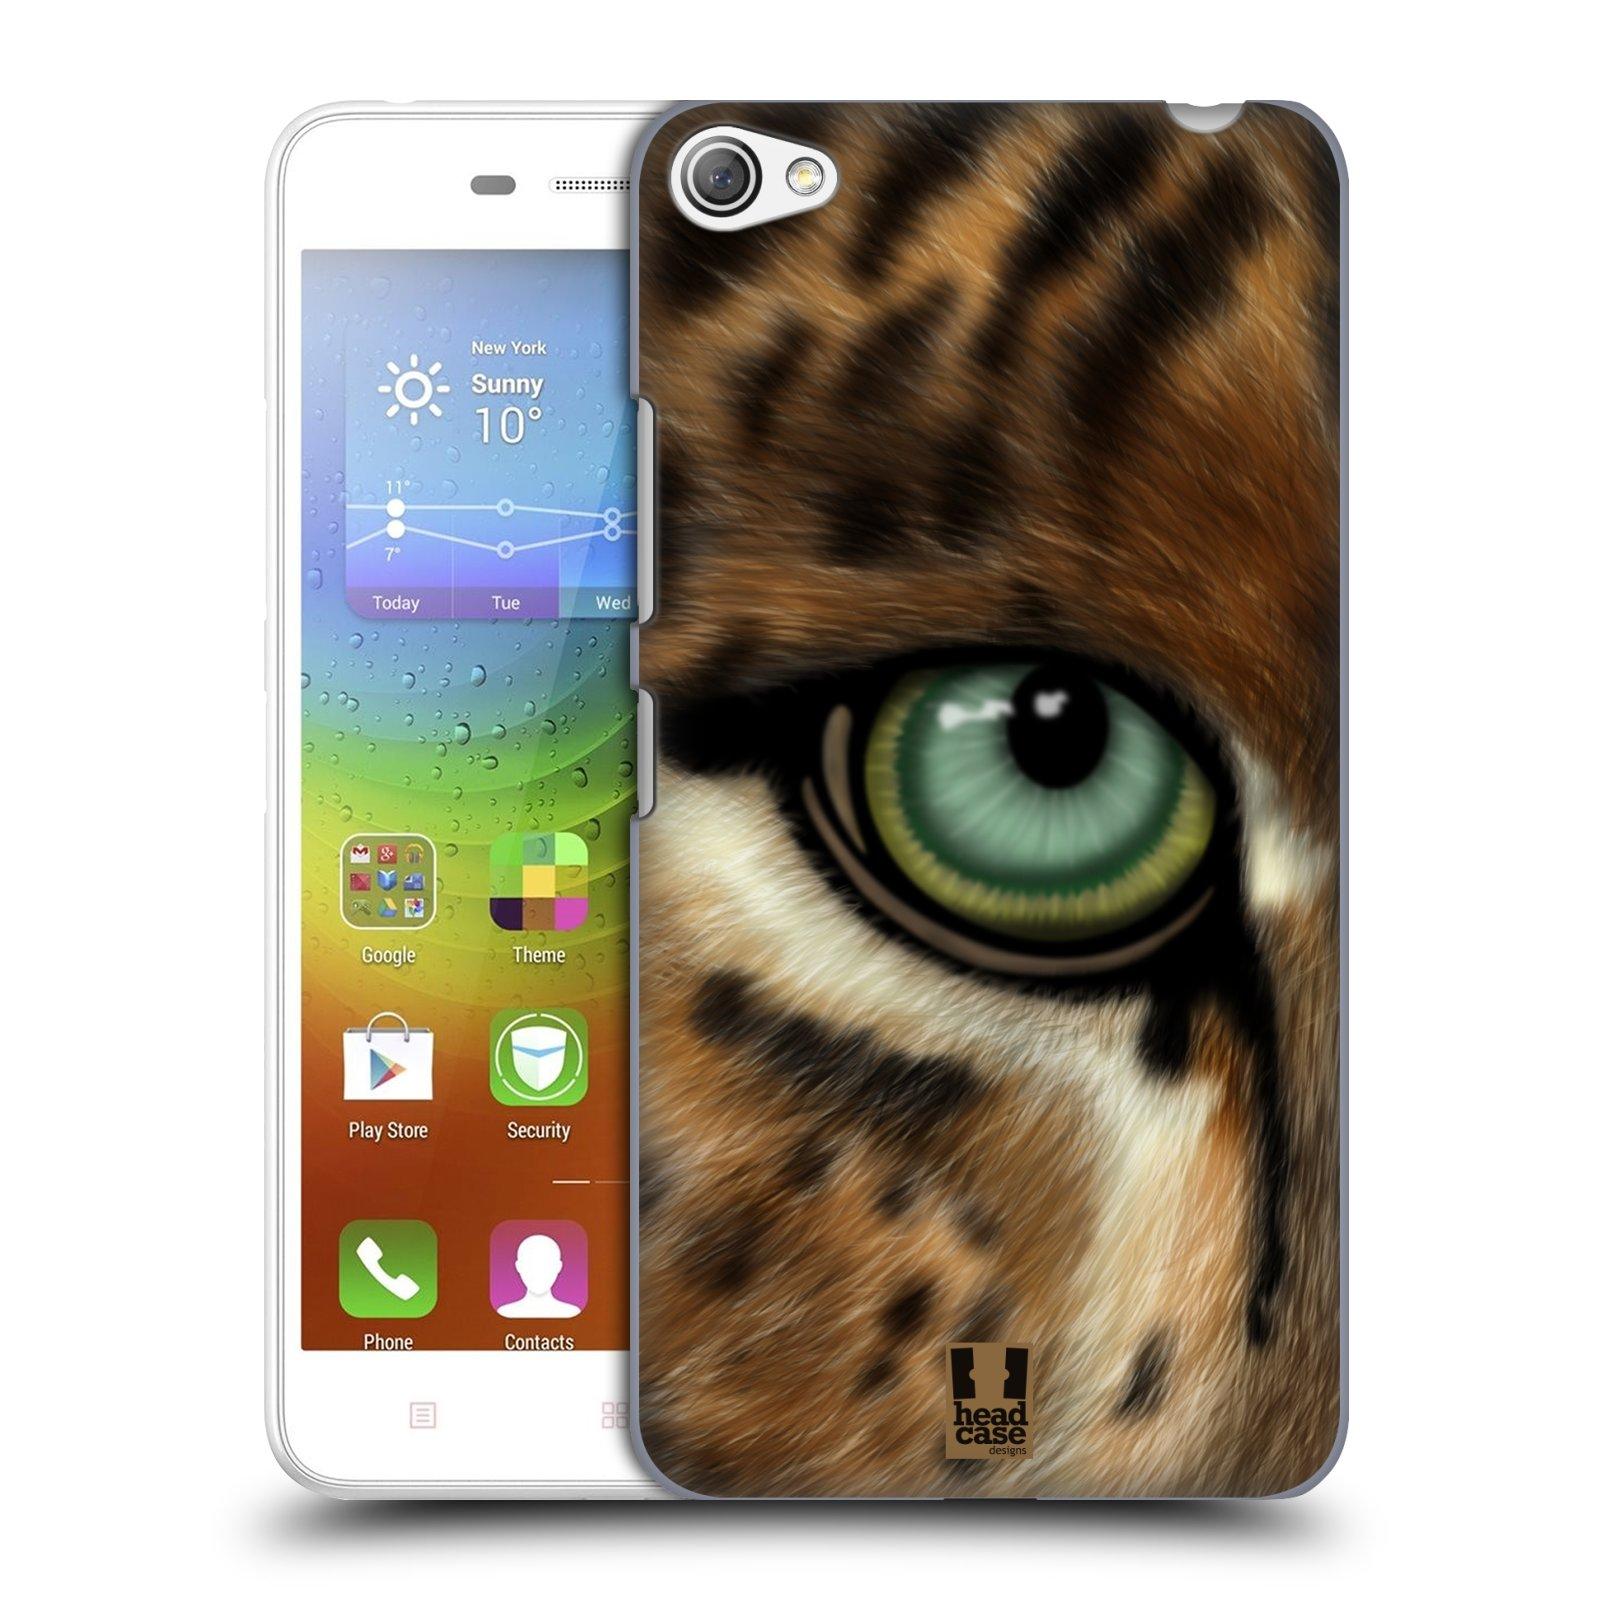 HEAD CASE pevný plastový obal na mobil LENOVO S60 / LENOVO S60 DUAL SIM vzor pohled zvířete oko leopard